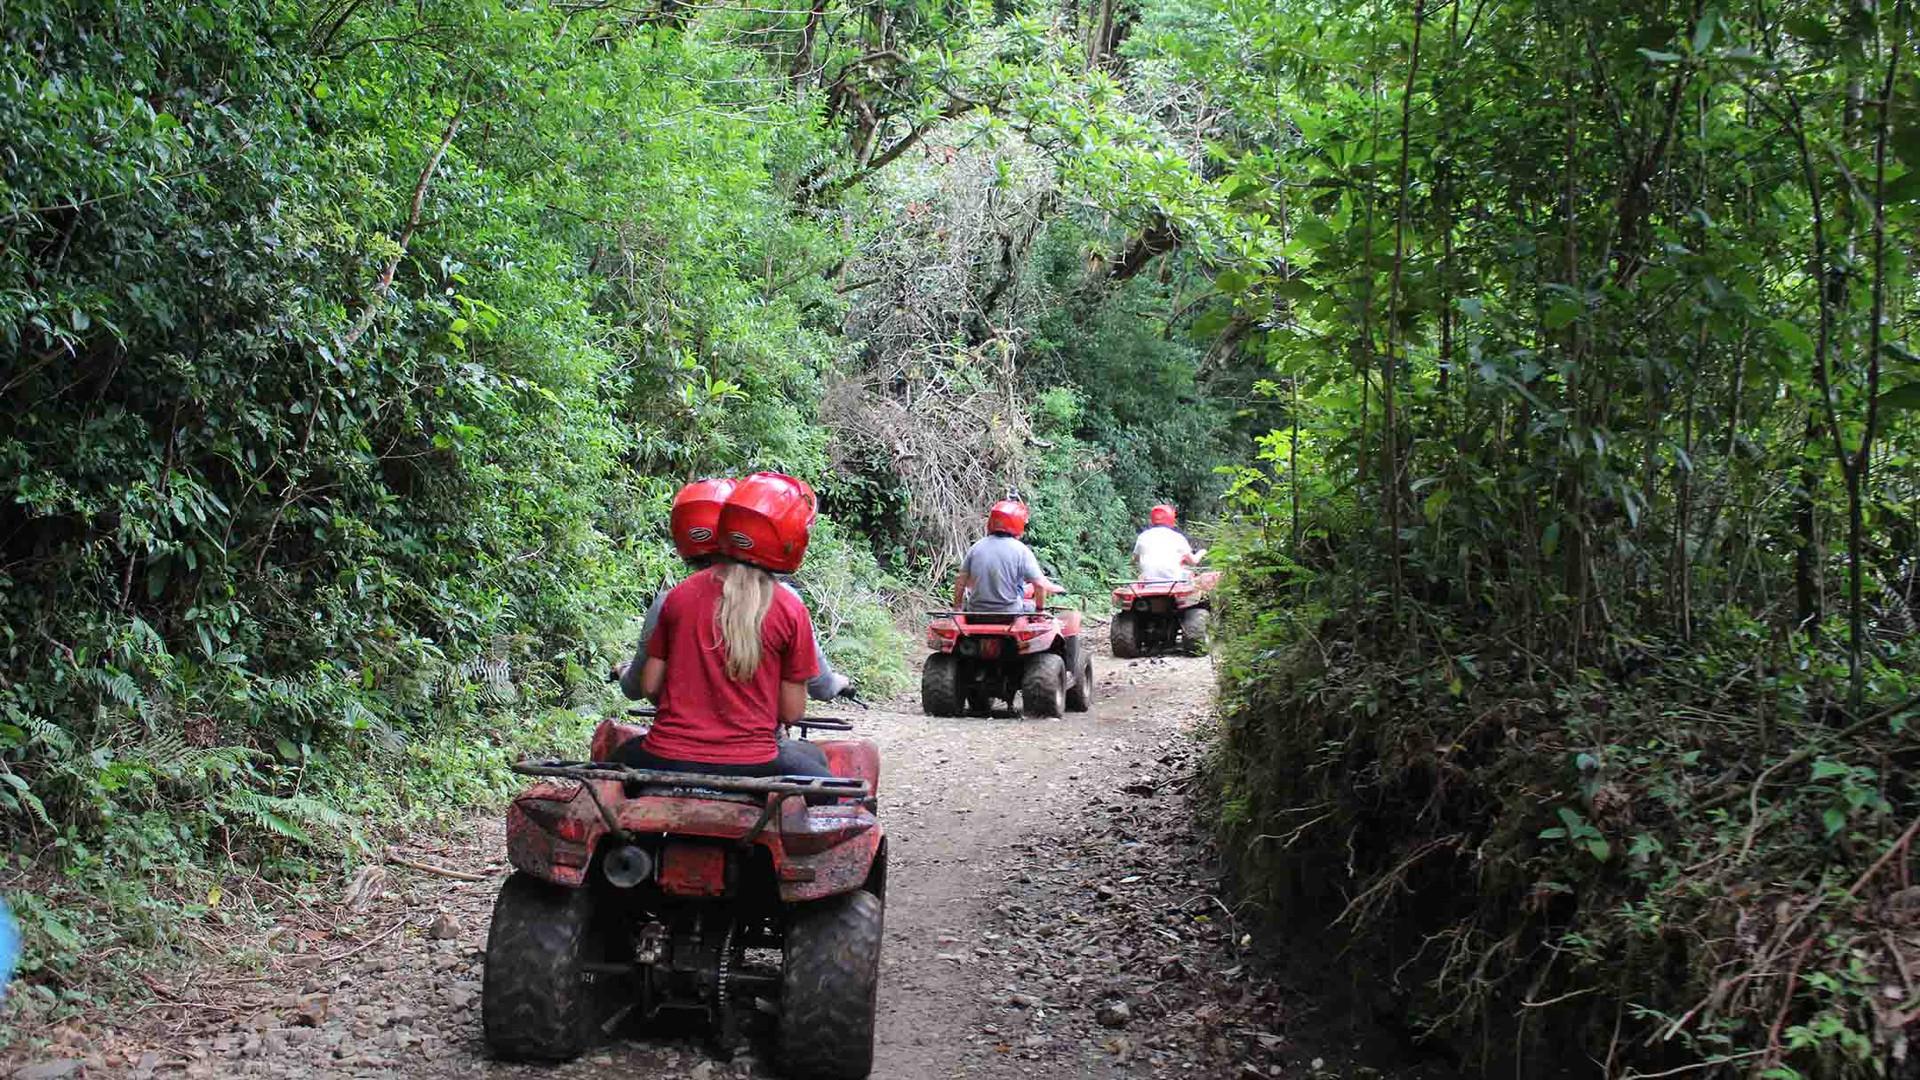 Monteverde Costa Rica ATV adventure tour group driving riding on jungle trail